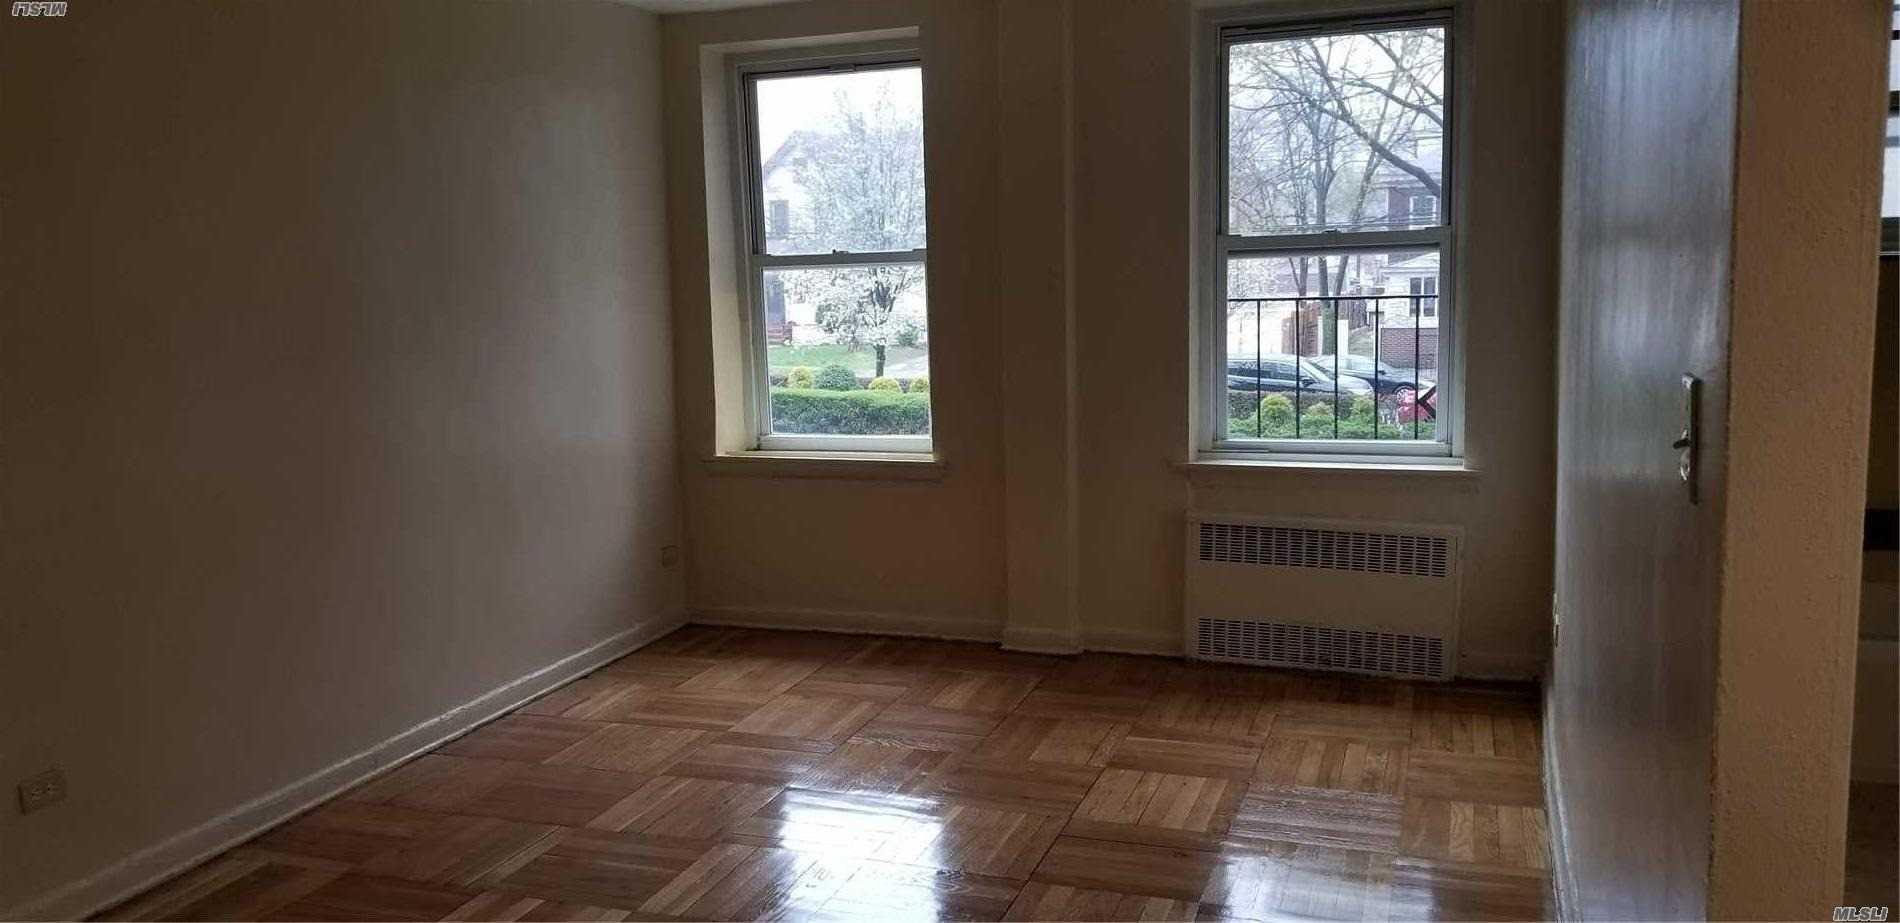 84-50 169th St, 119 - Jamaica Estates, New York